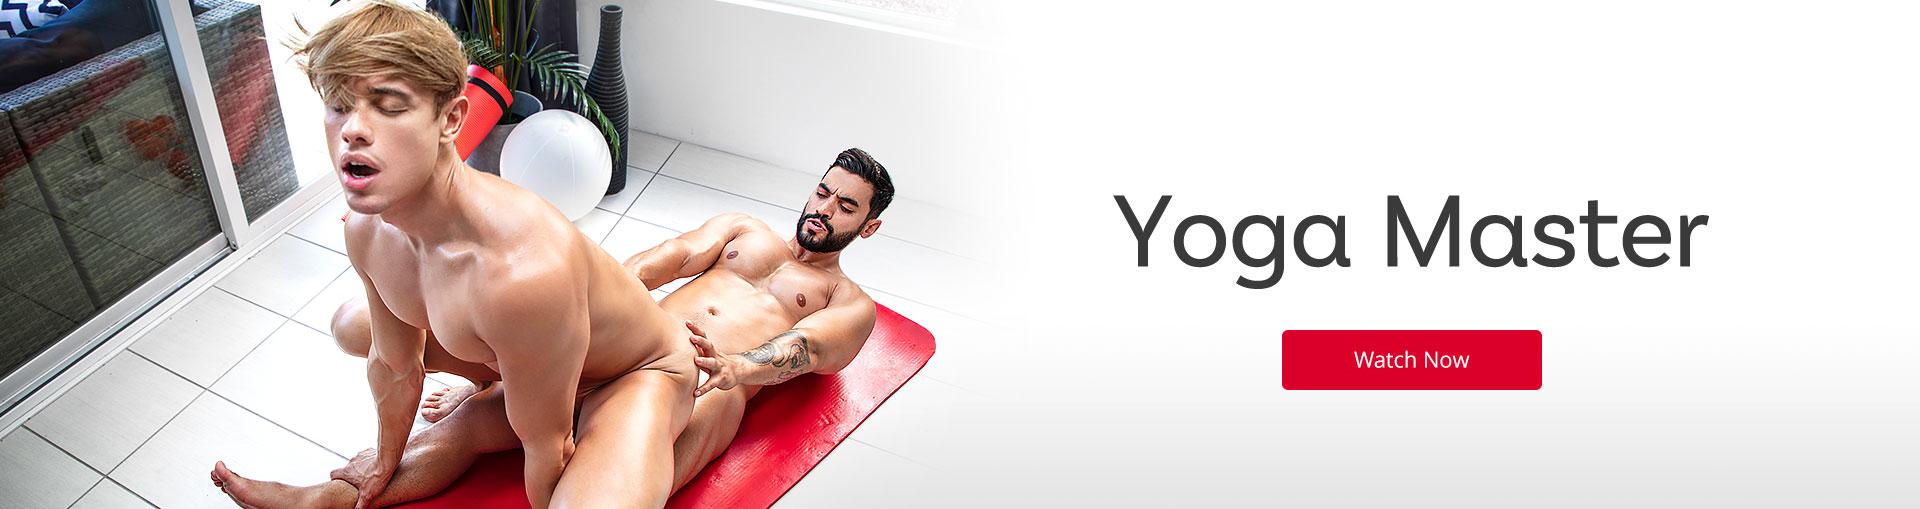 Yoga Master Featuring Alam Wernik and Arad Winwin